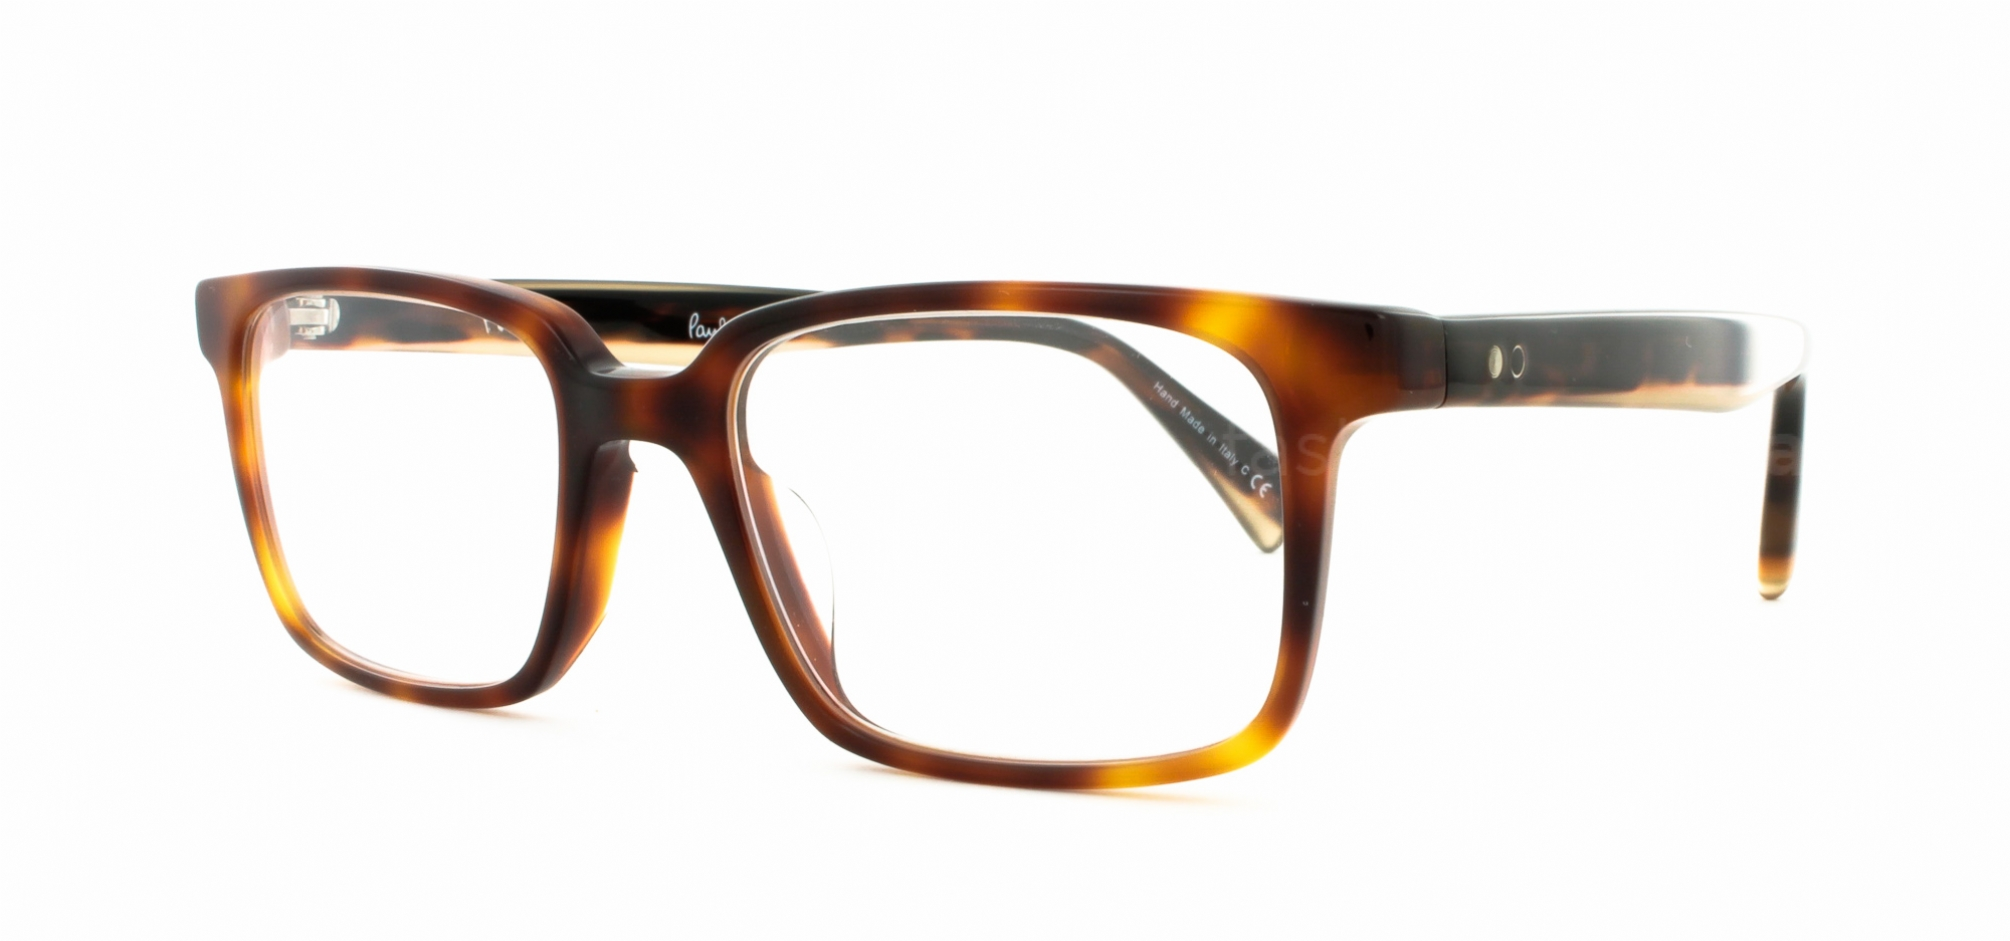 paul smith branwell eyeglasses